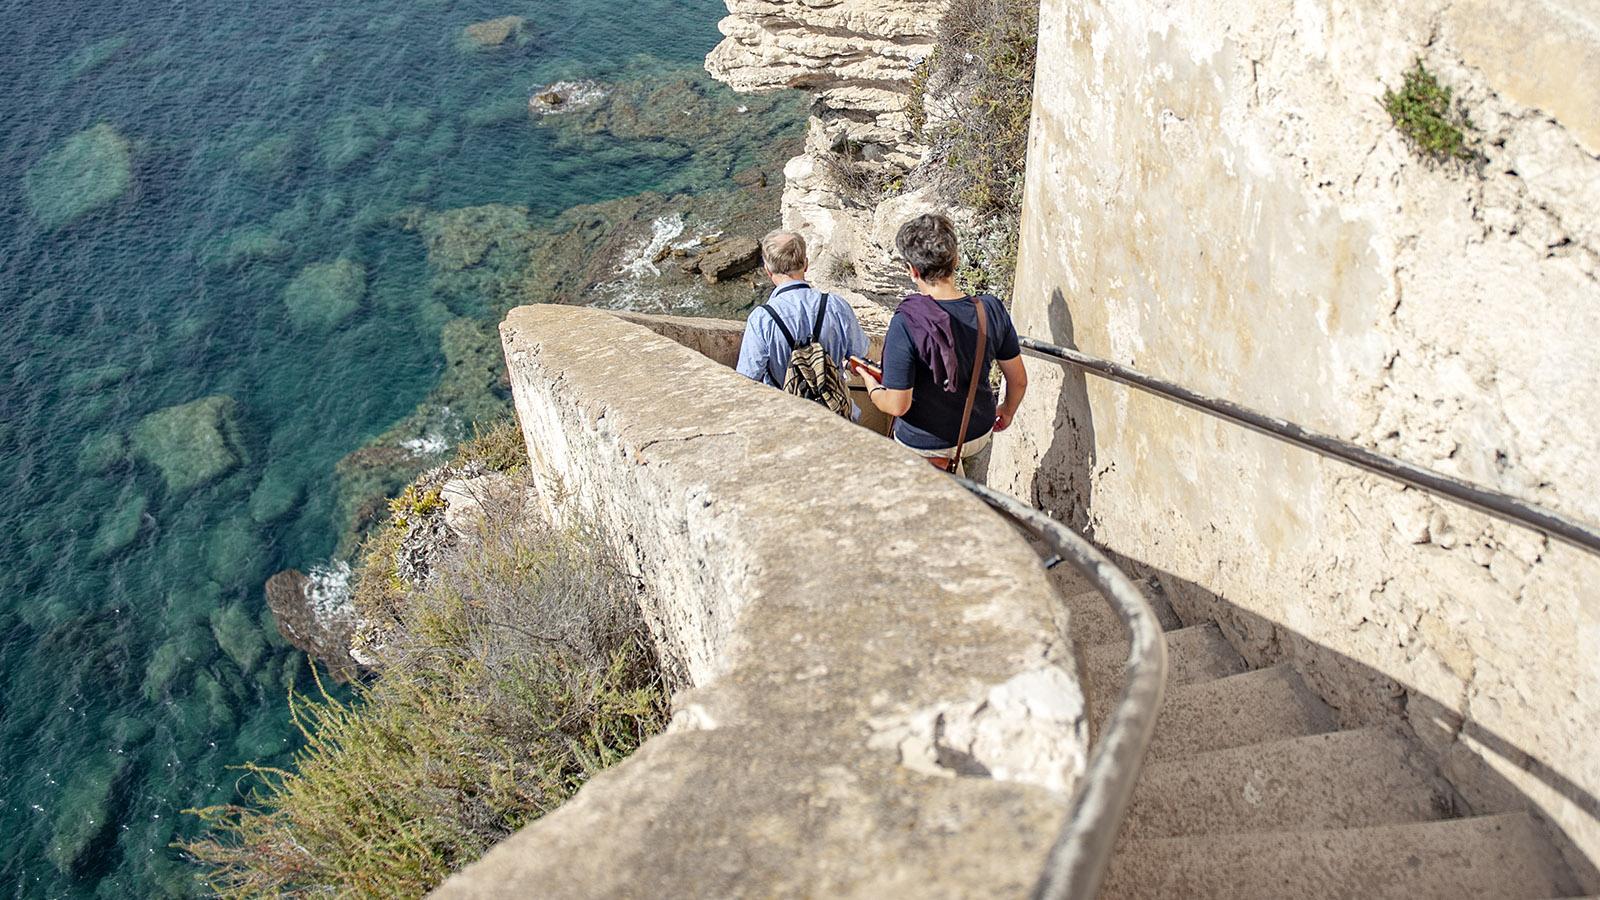 Bonifacio: Steiler Steig an der Klippe: die Escalier d'Aragon. Foto: Hilke Maunder